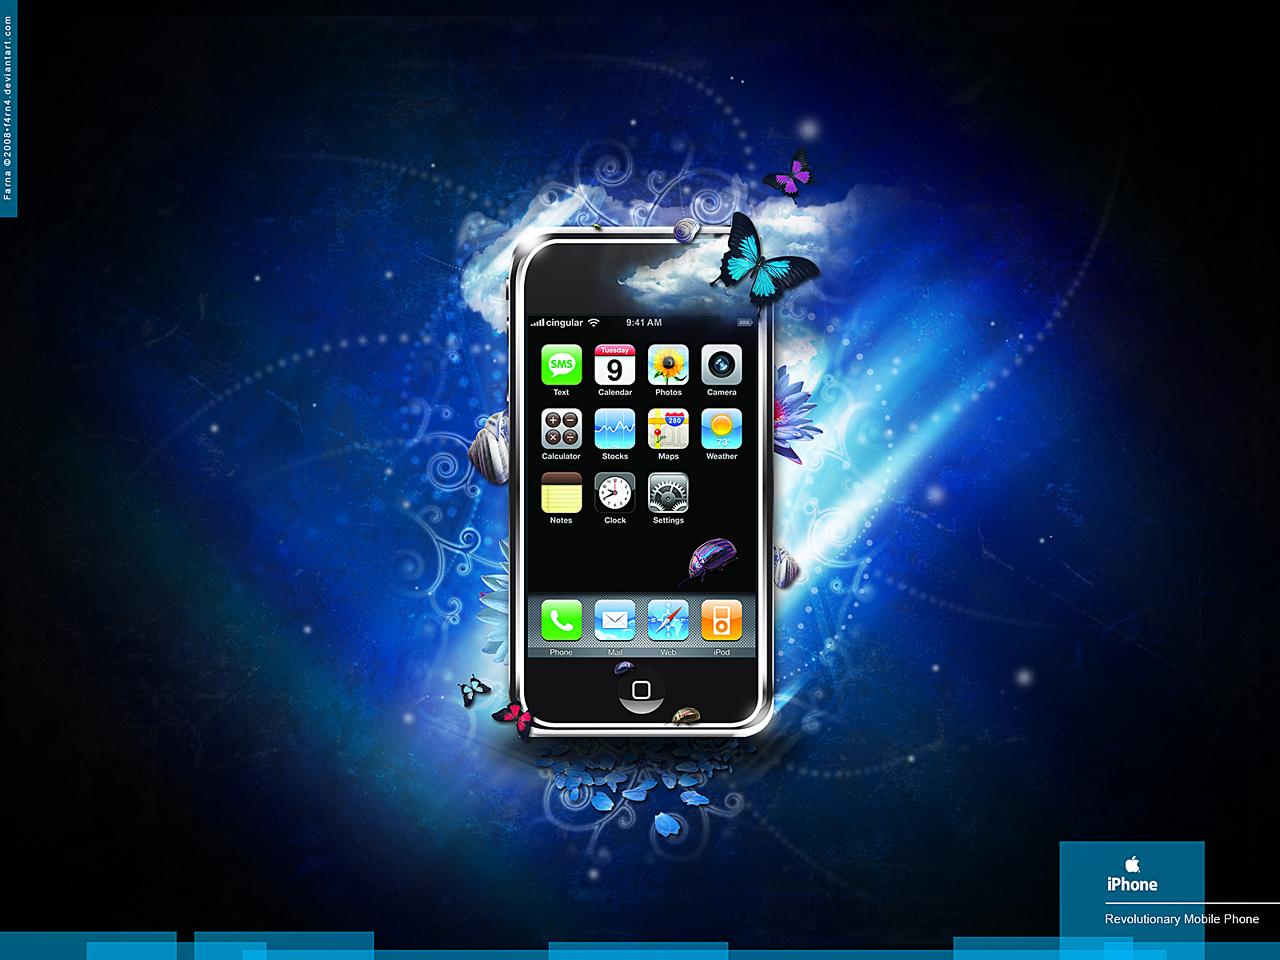 Iphone 7 Hd Wallpaper: Iphone Hd Wallpaper Home Screen